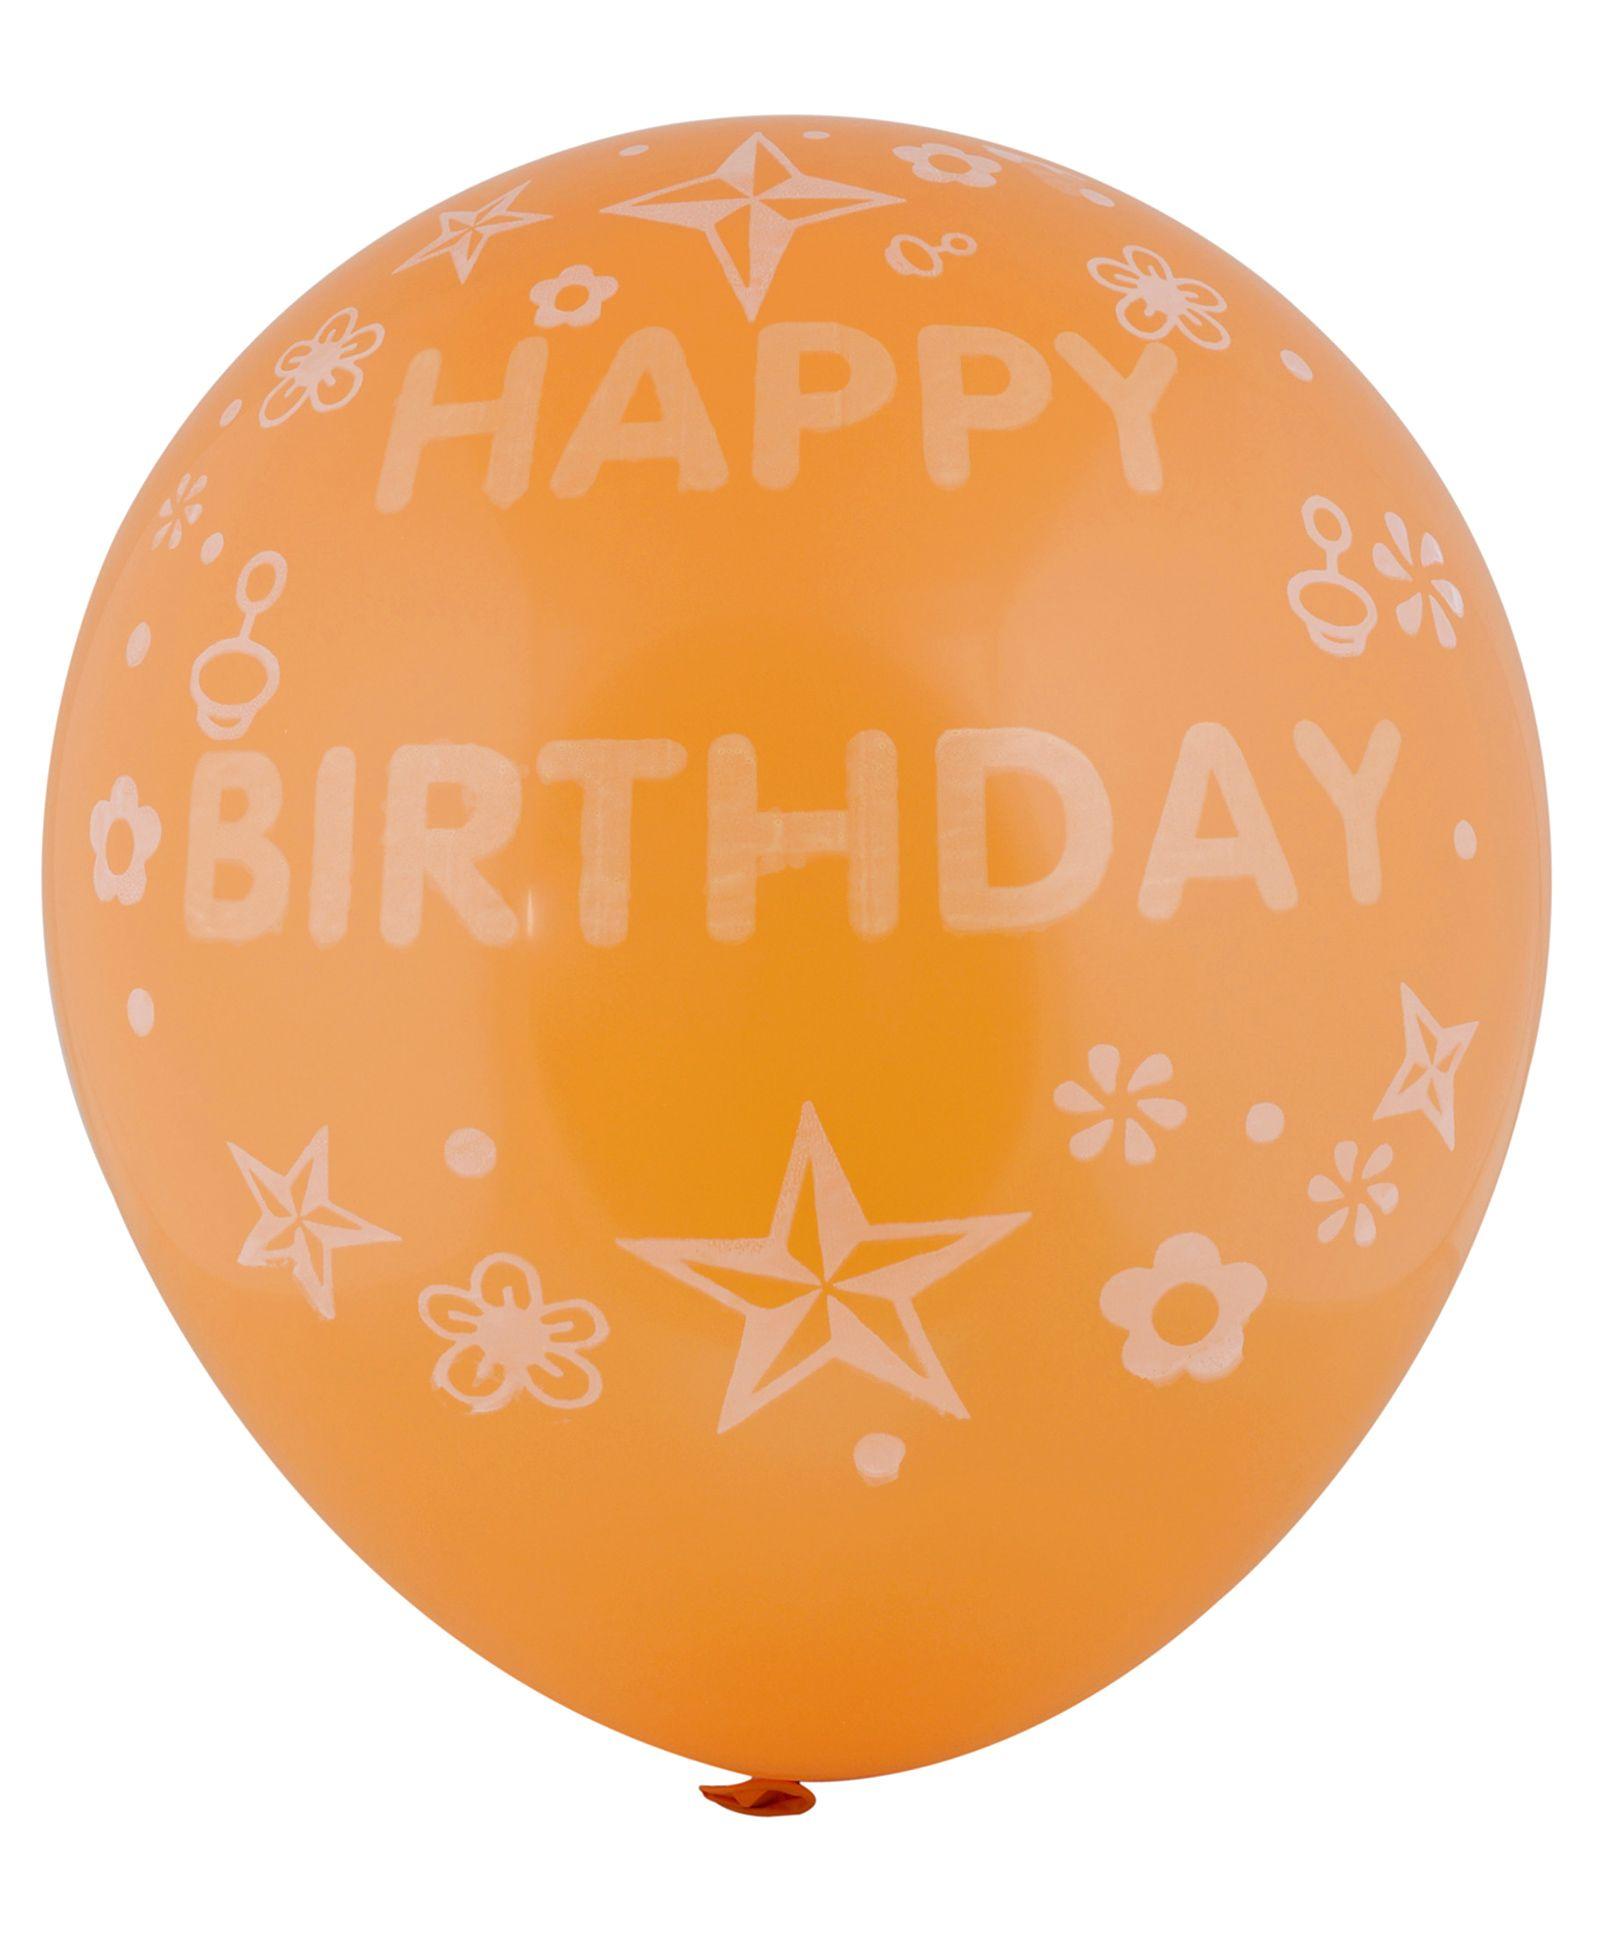 SmartCraft Happy Birthday Big Balloon Colour May Vary